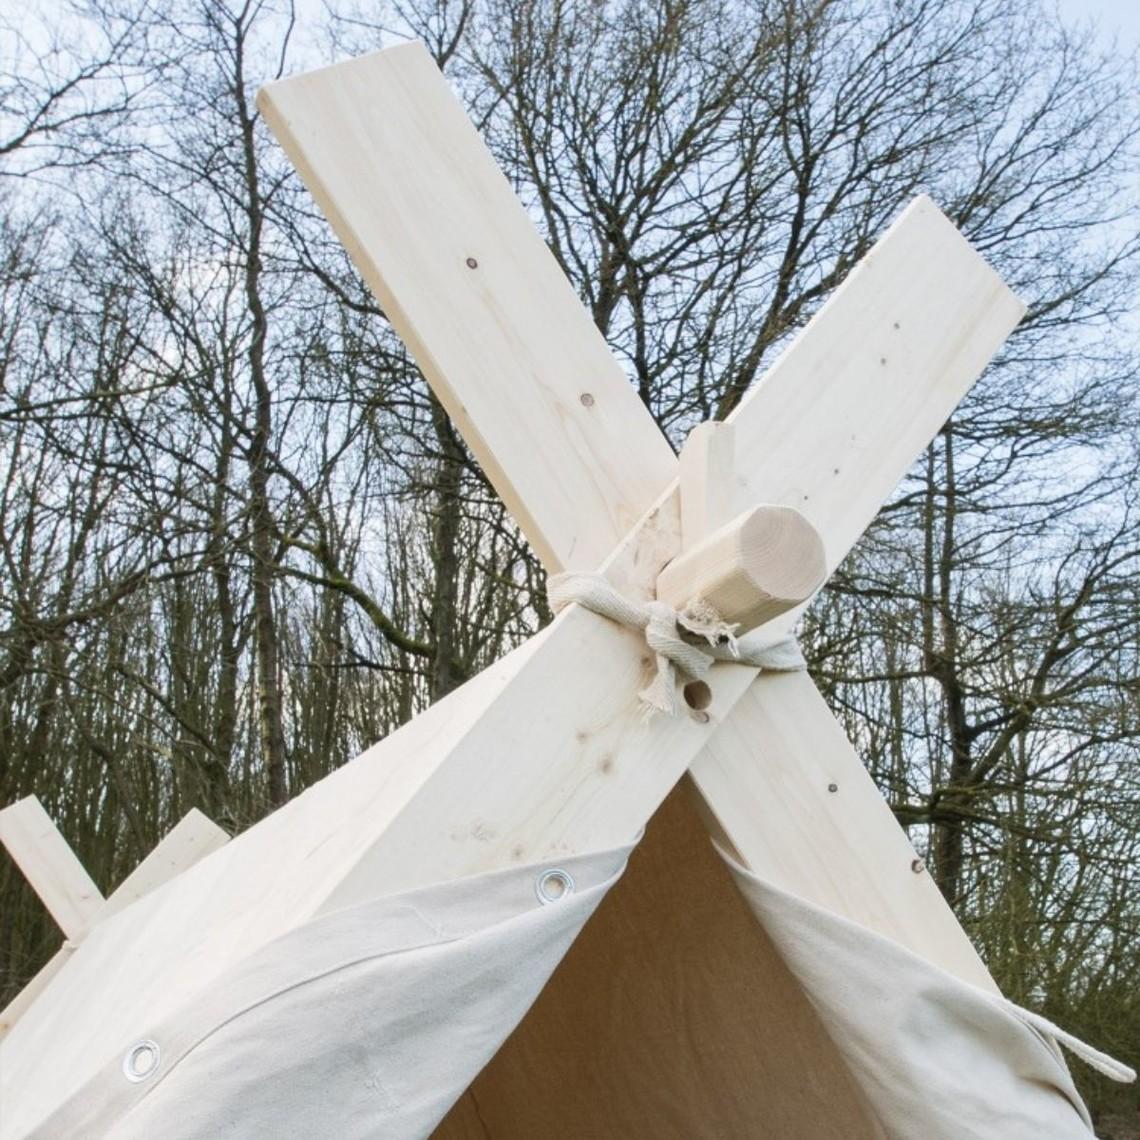 Vikingtent 2 x 2,3 x 1,8 m zonder frame, 350 gms